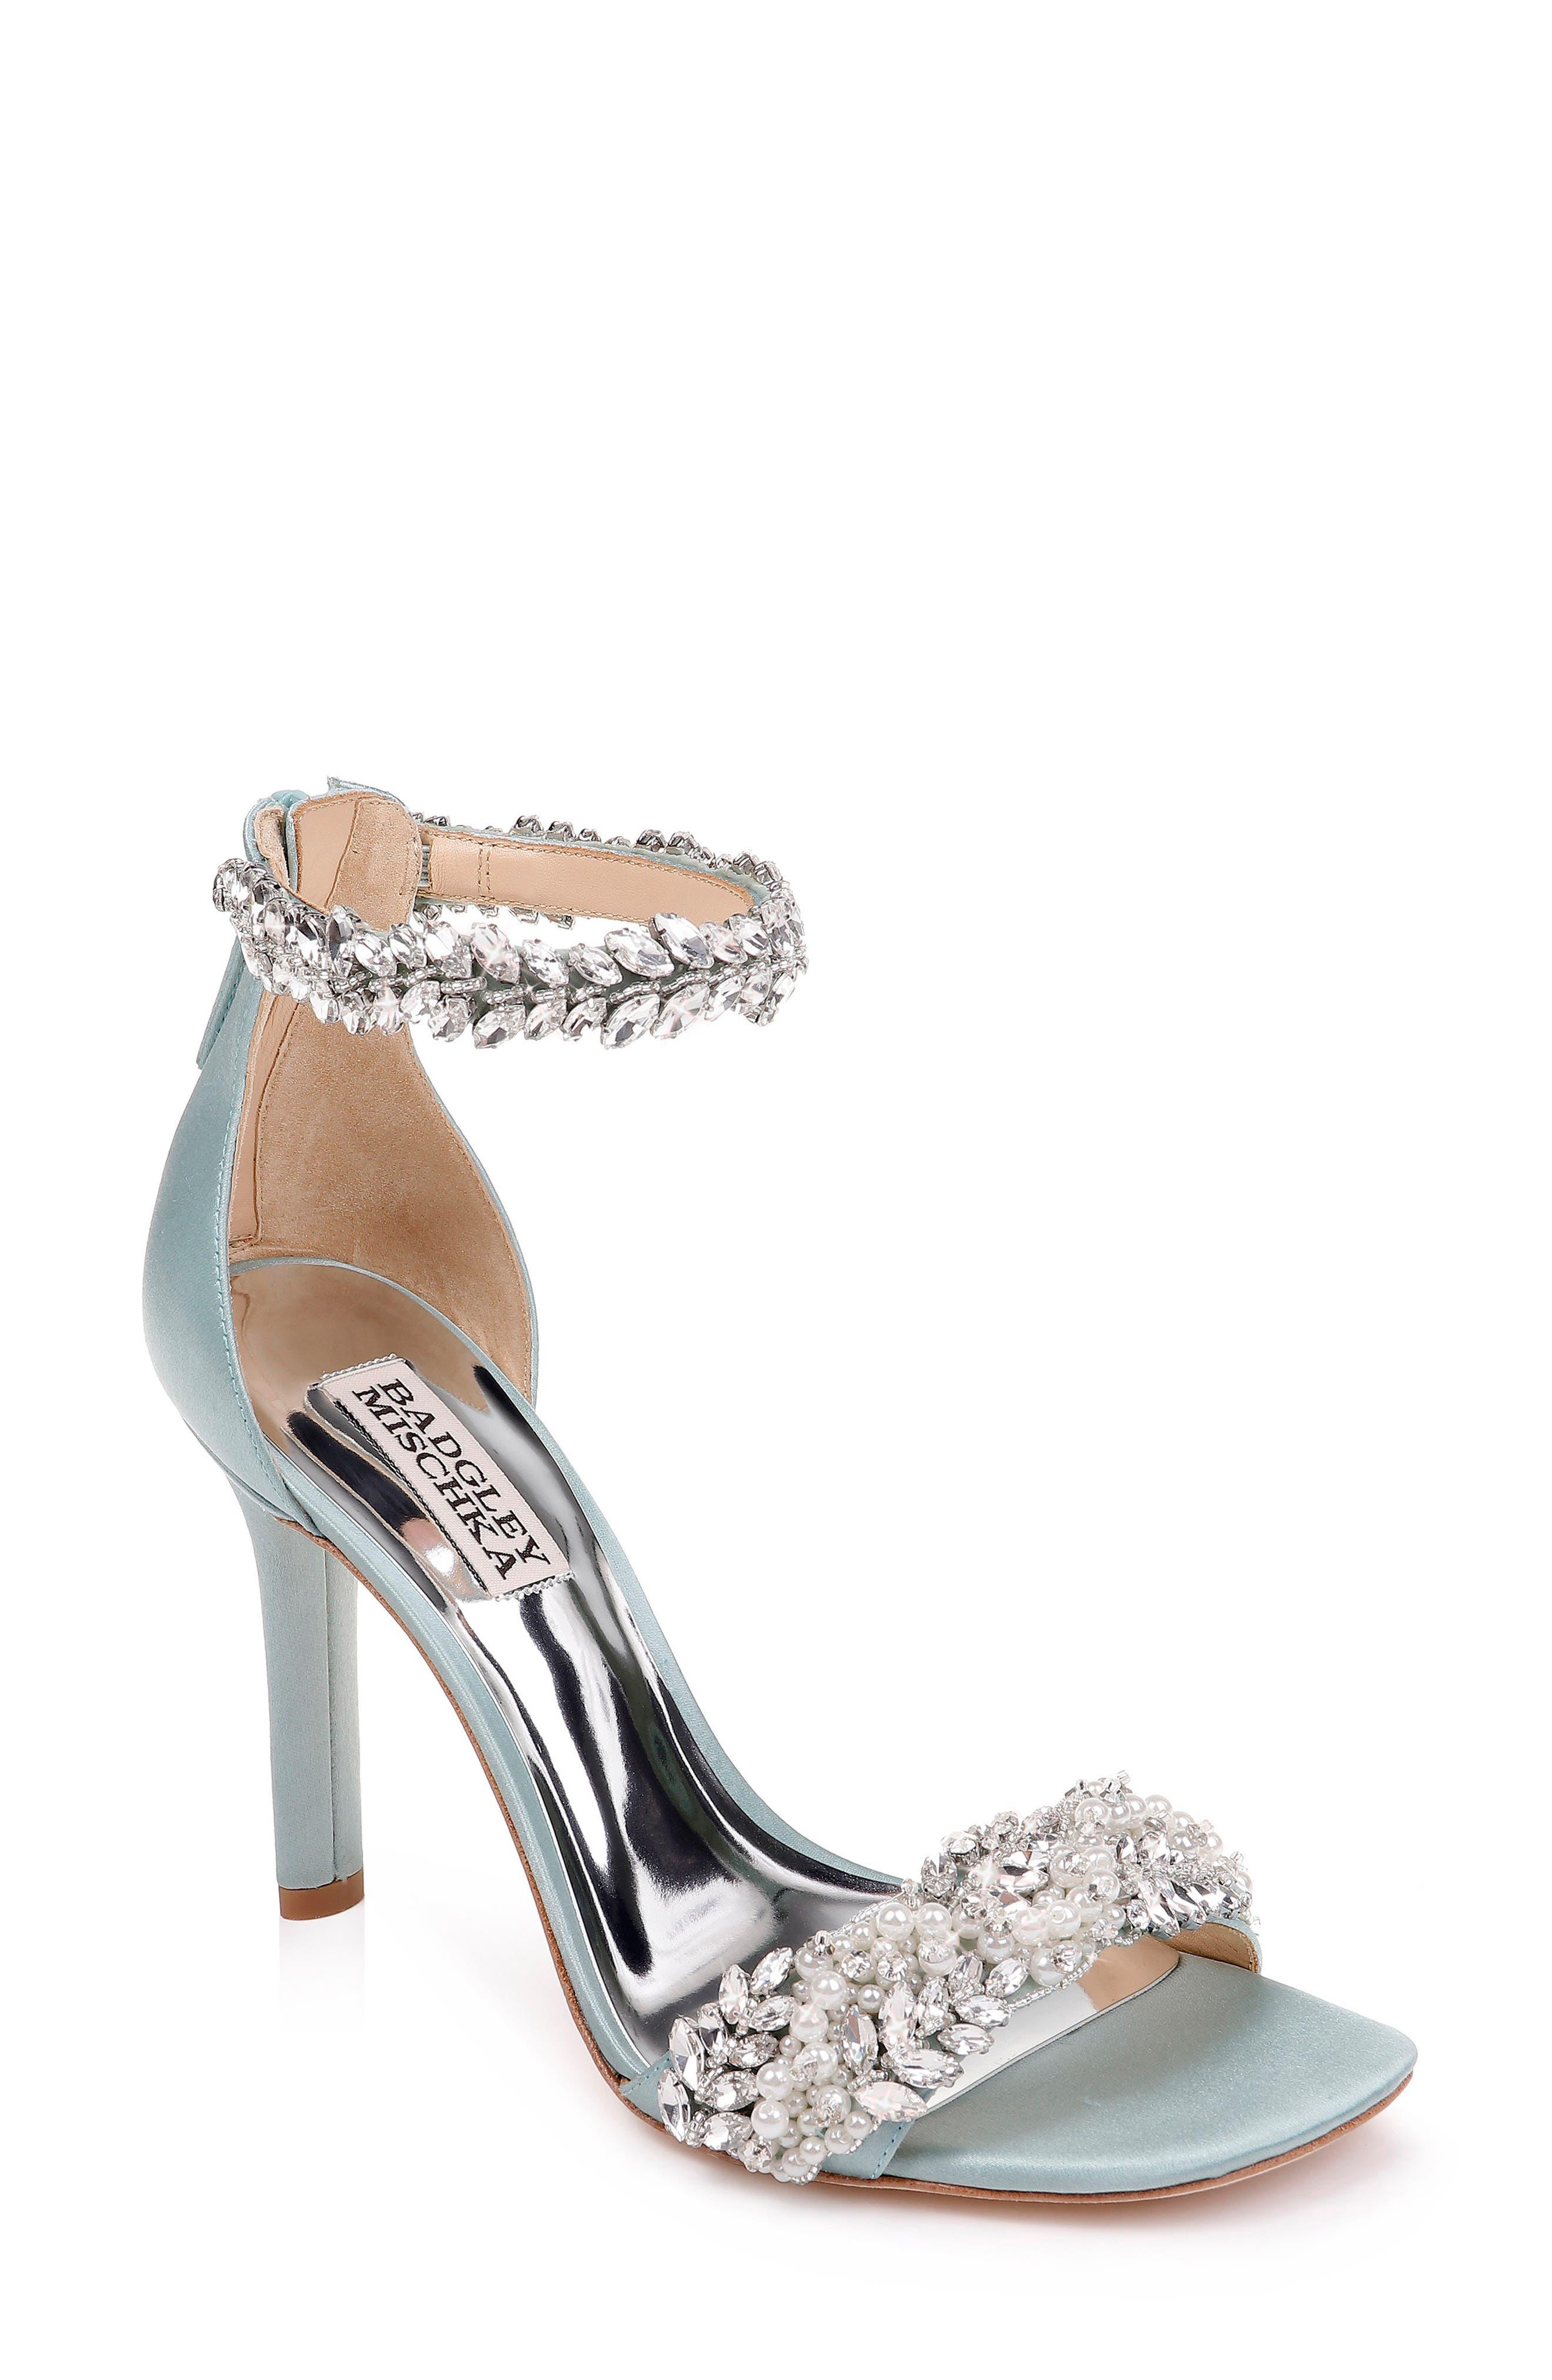 Badgley Mischka Fiorenza Crystal & Imitation Pearl Embellished Sandal in Blue Radiance Satin